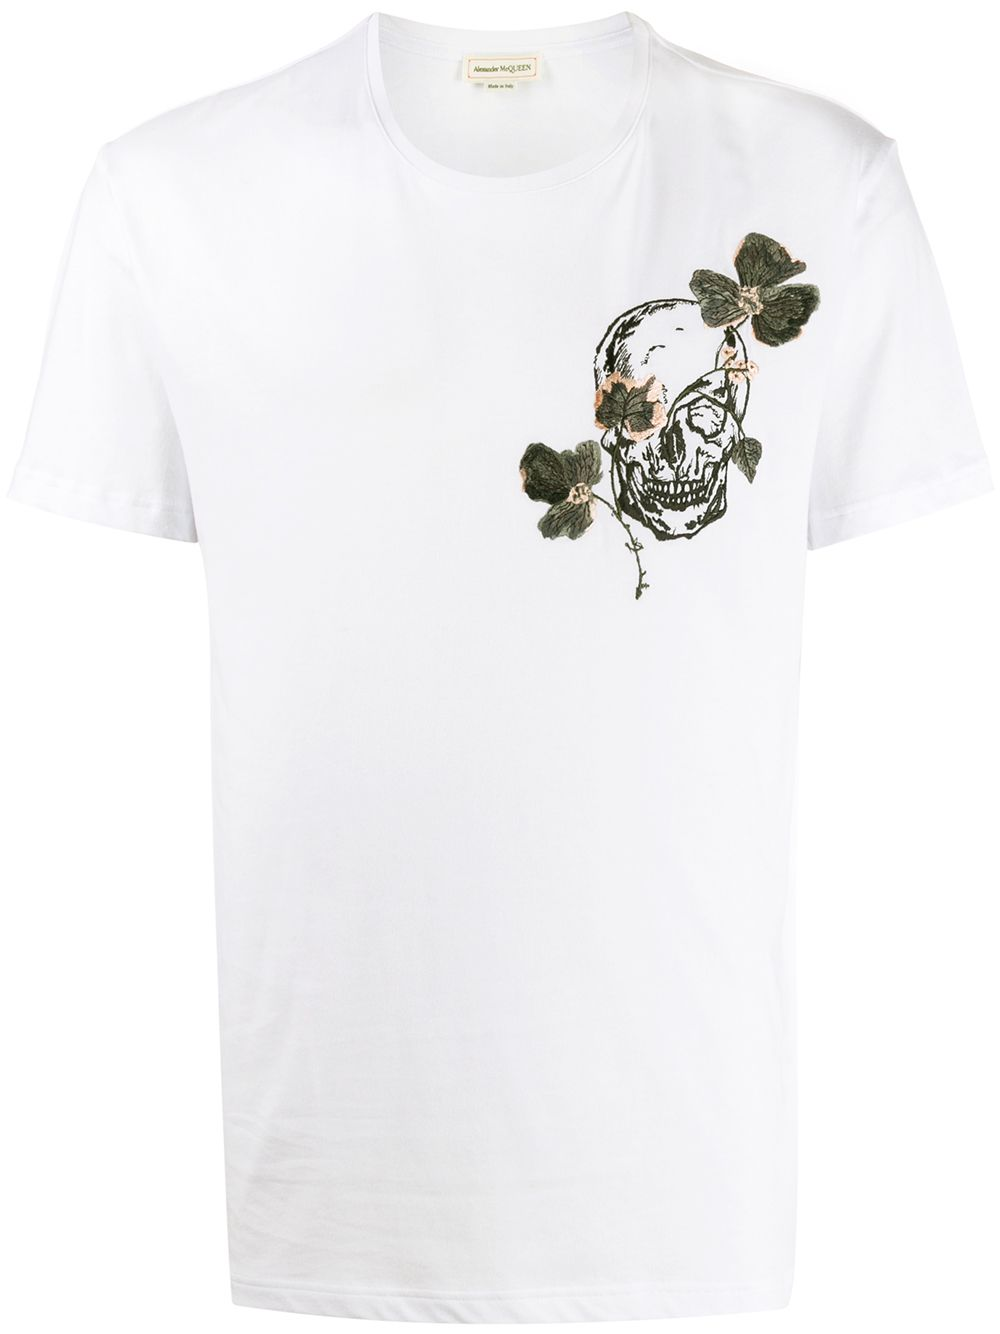 Skull And Flowers Print T-shirt